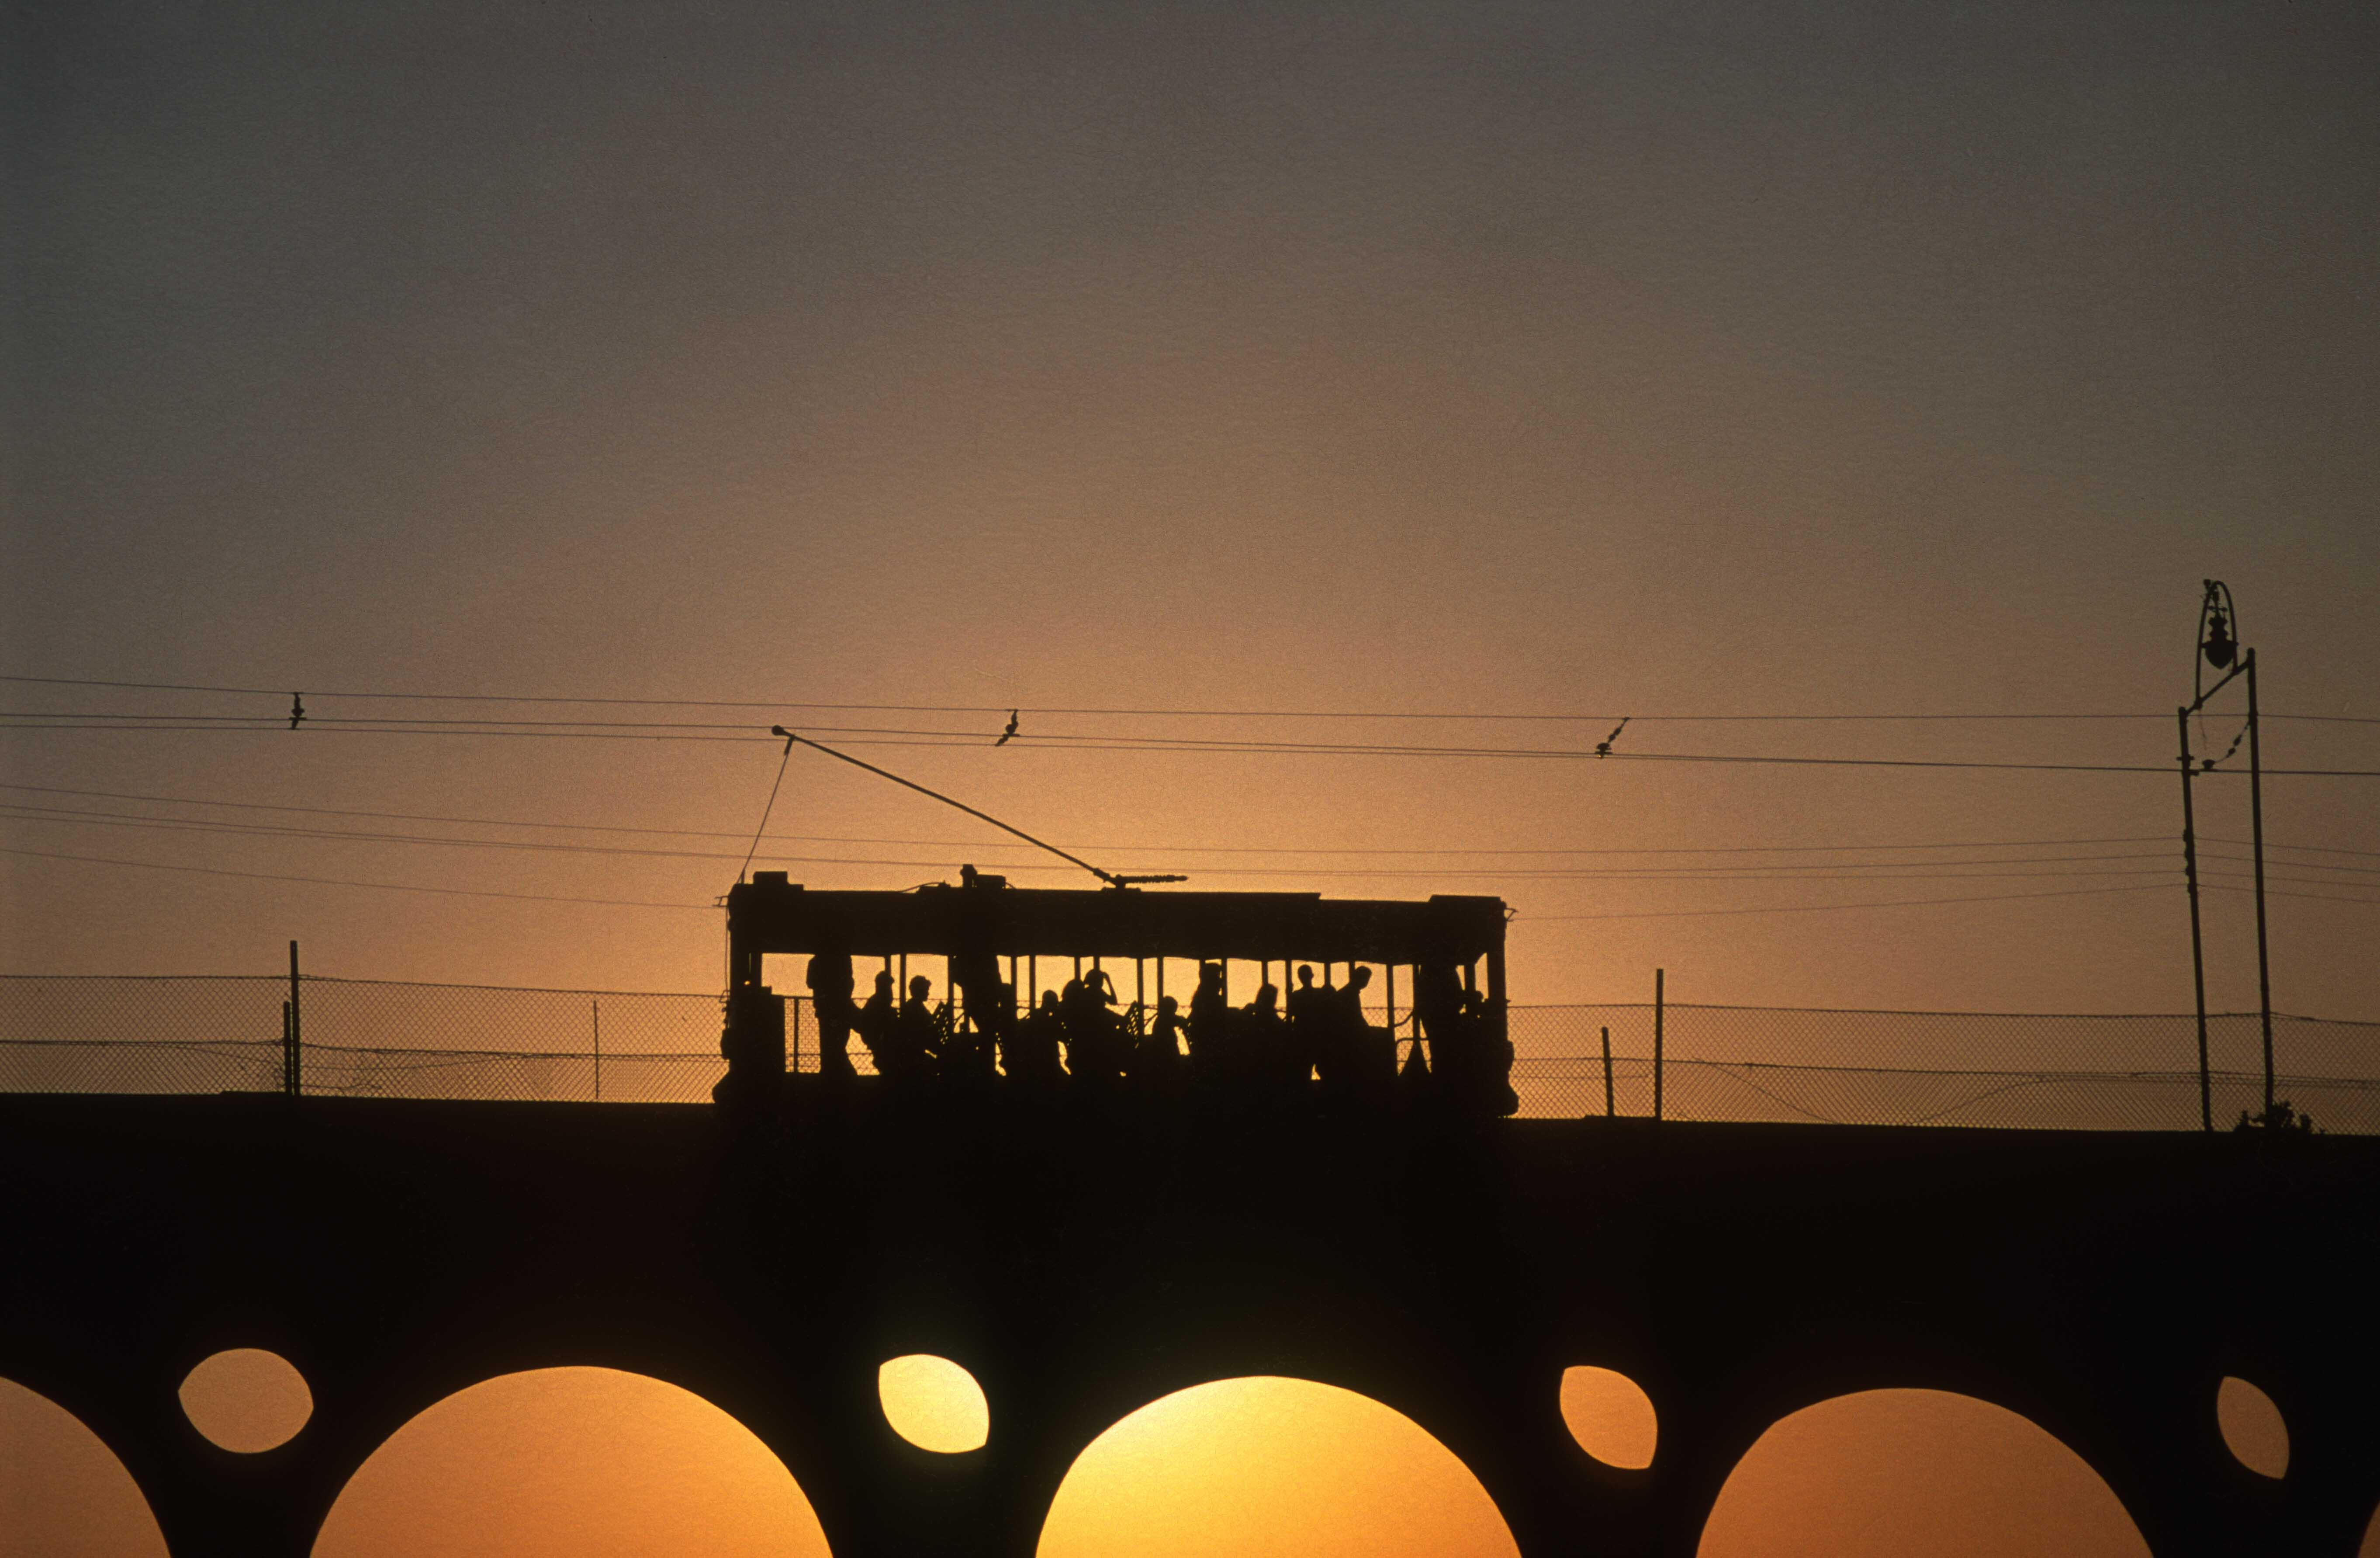 T13535. Tram on the Arco de Treles at sunset. Centro. Rio de Janeiro. Brazil. 7.8.2002crop